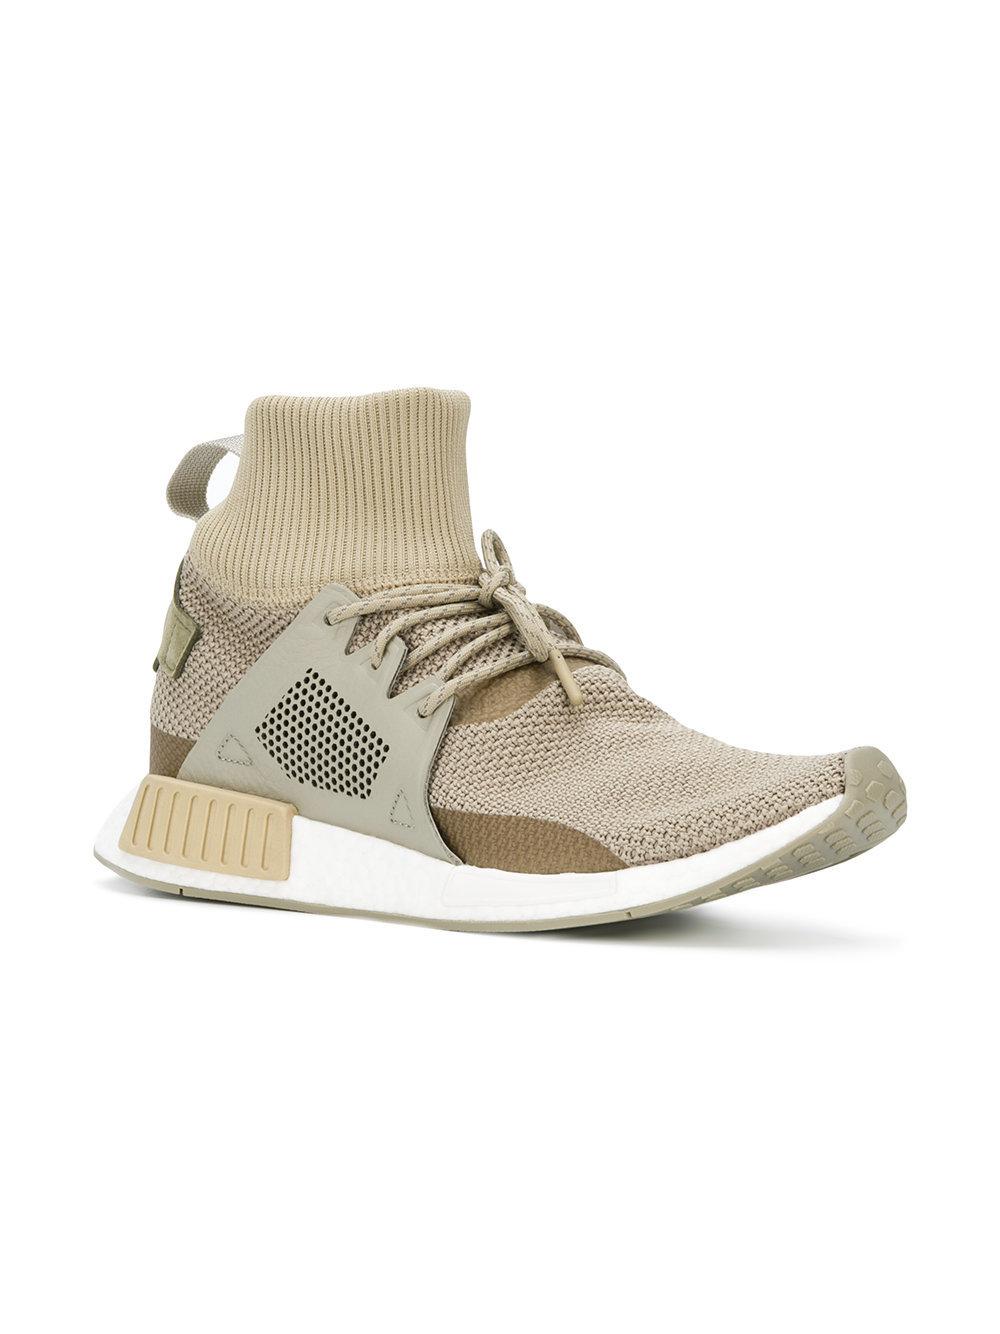 9924ec65b adidas Originals Nmd Xr1 Winter Sneakers